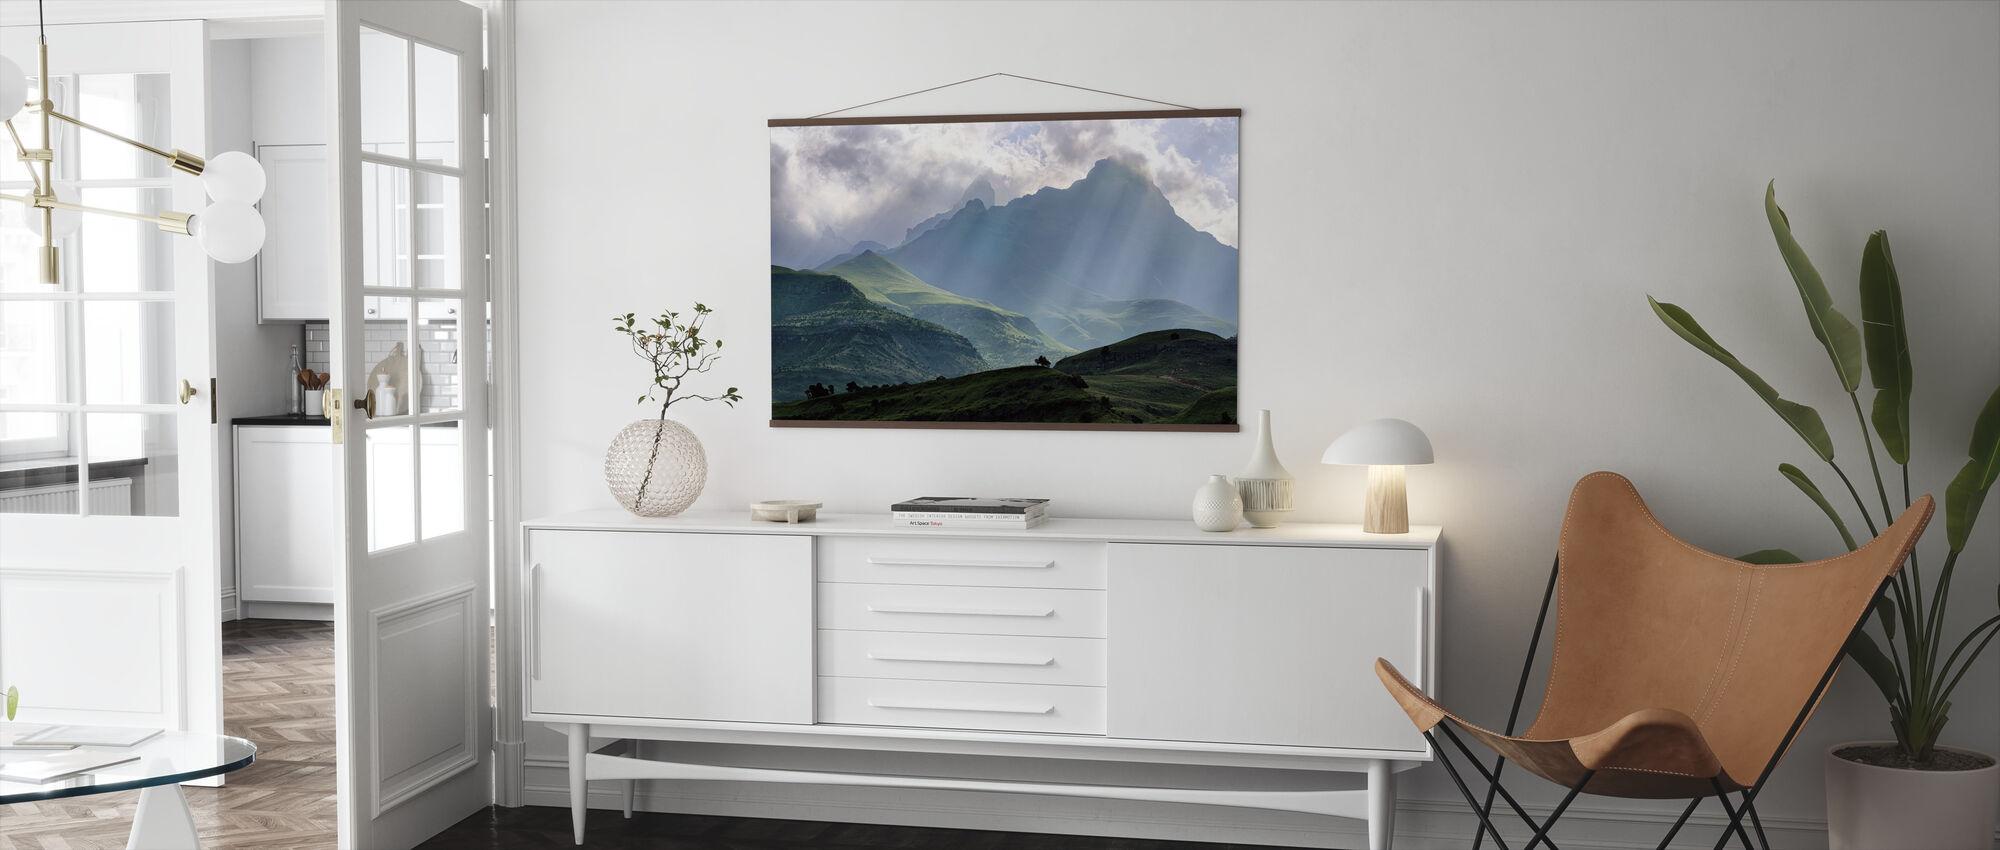 Mnweni Rays - Poster - Living Room